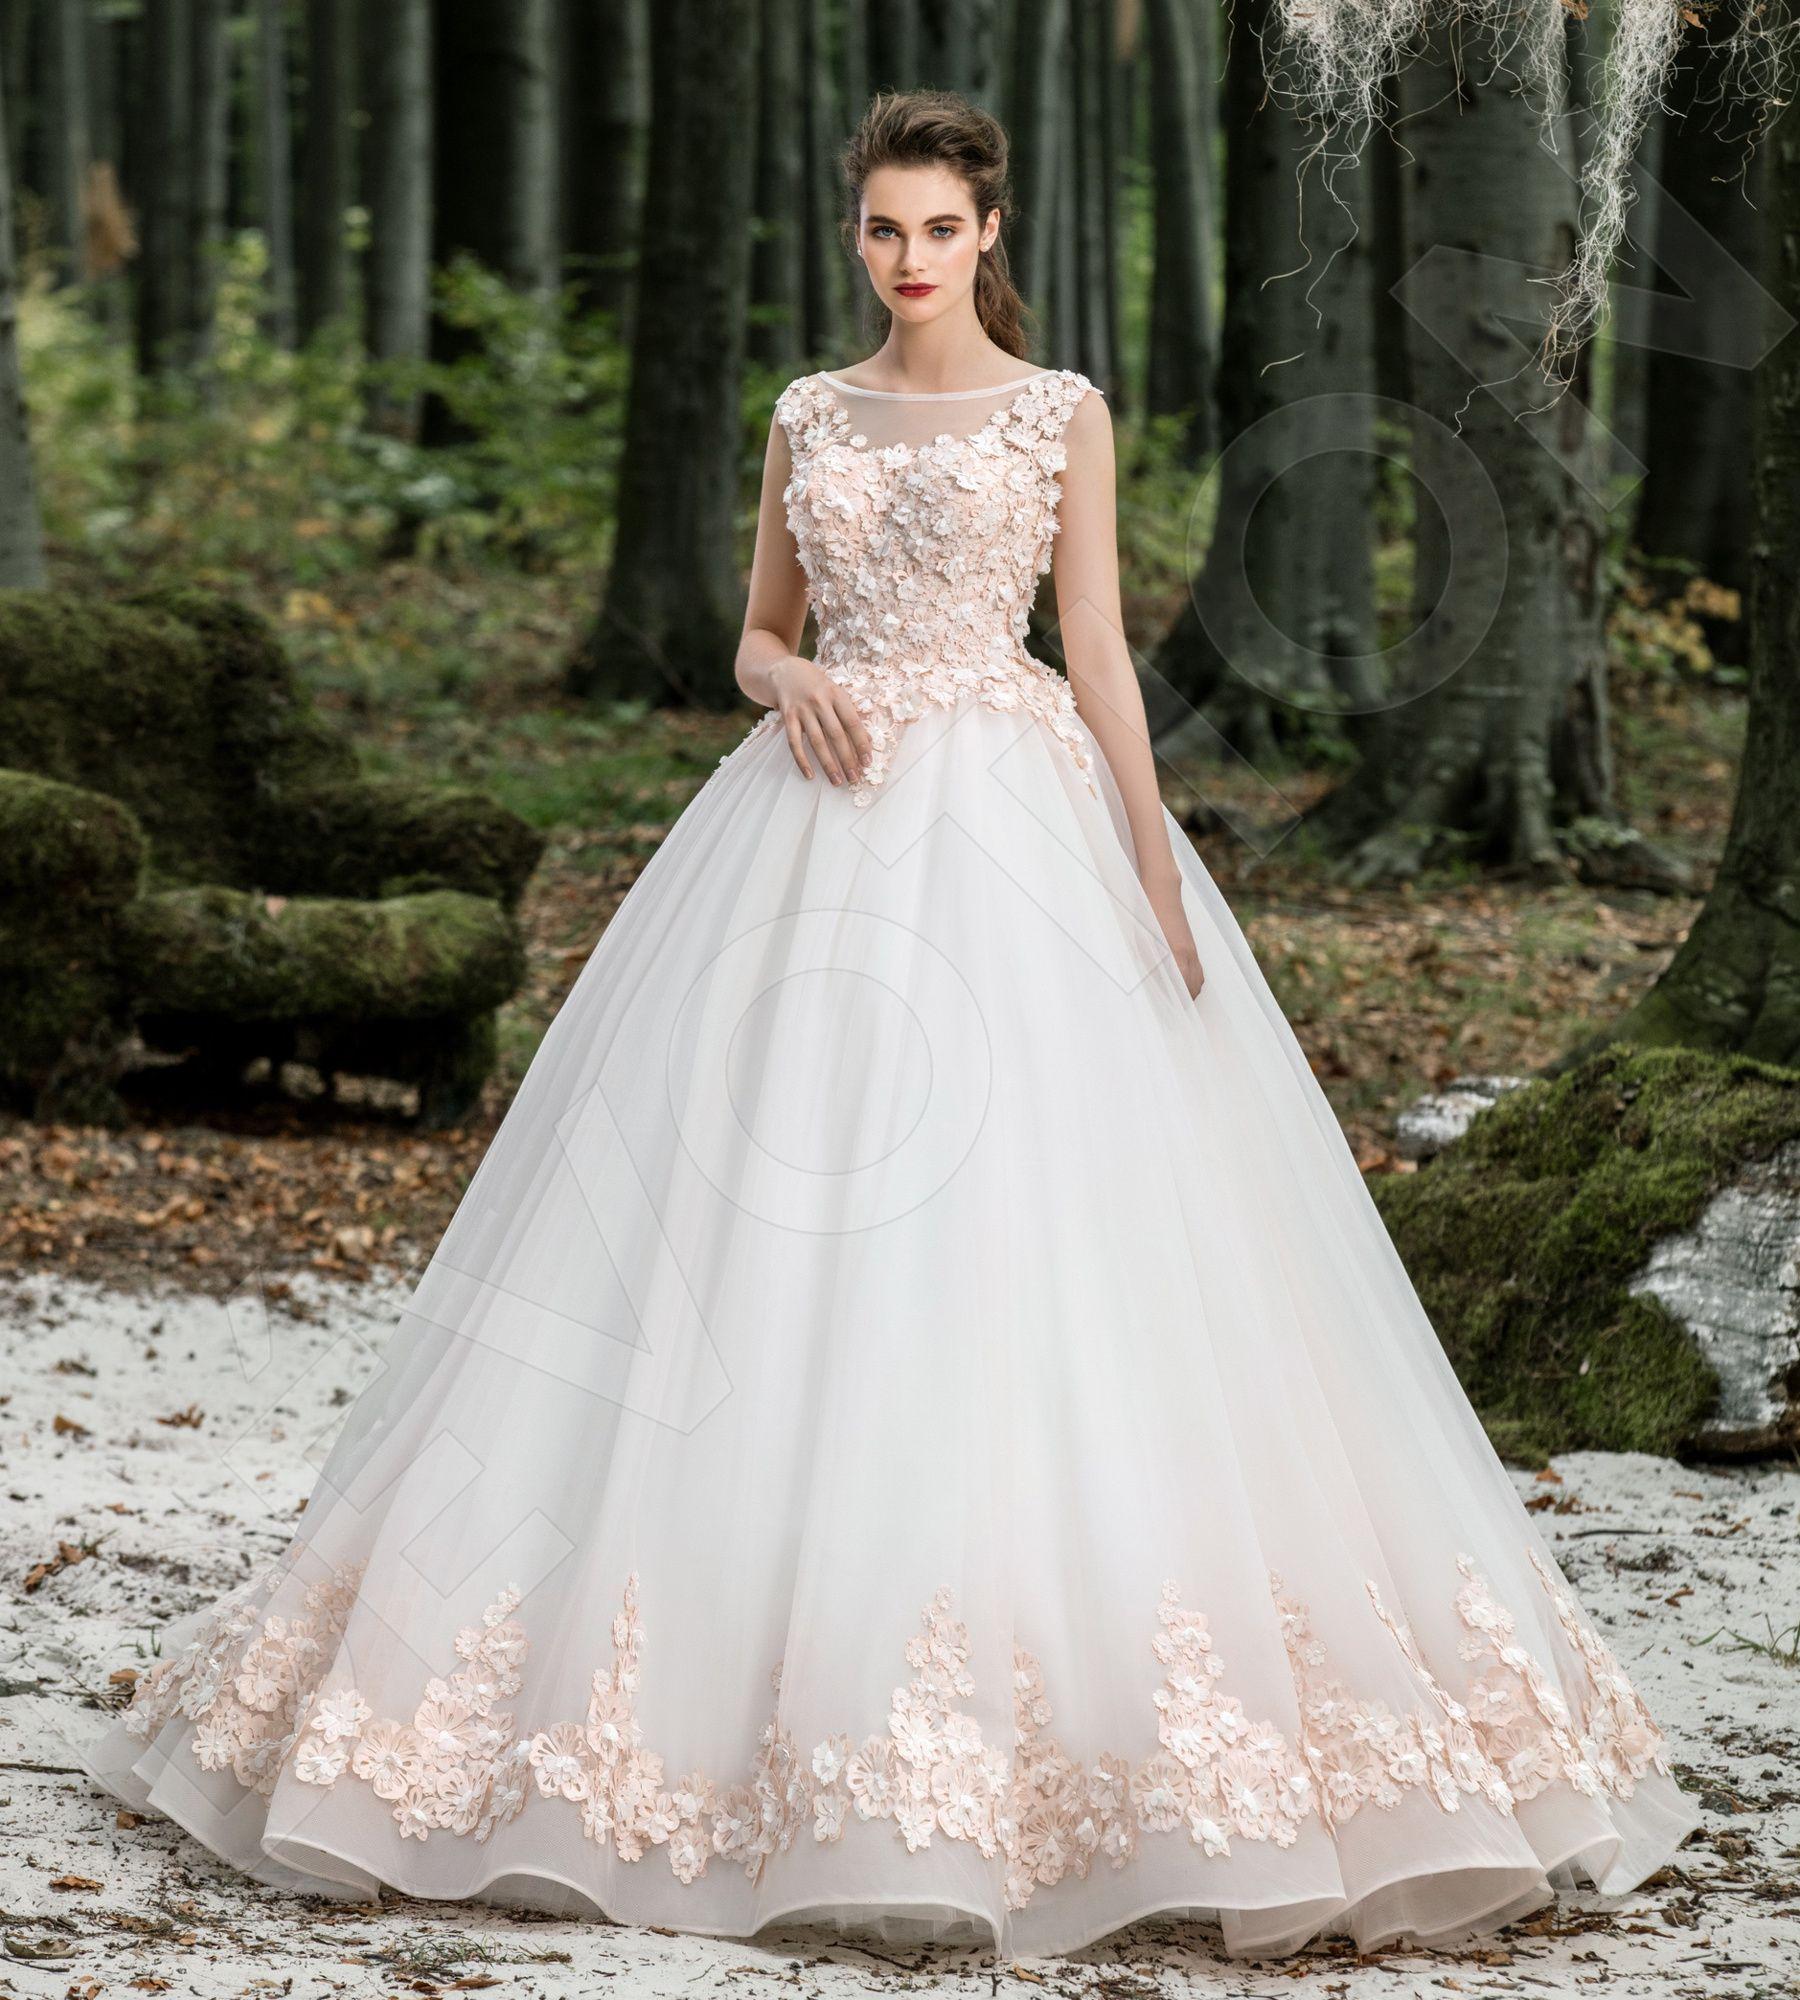 Ambrosia Classic Mesh Wedding dress White / Powder ...